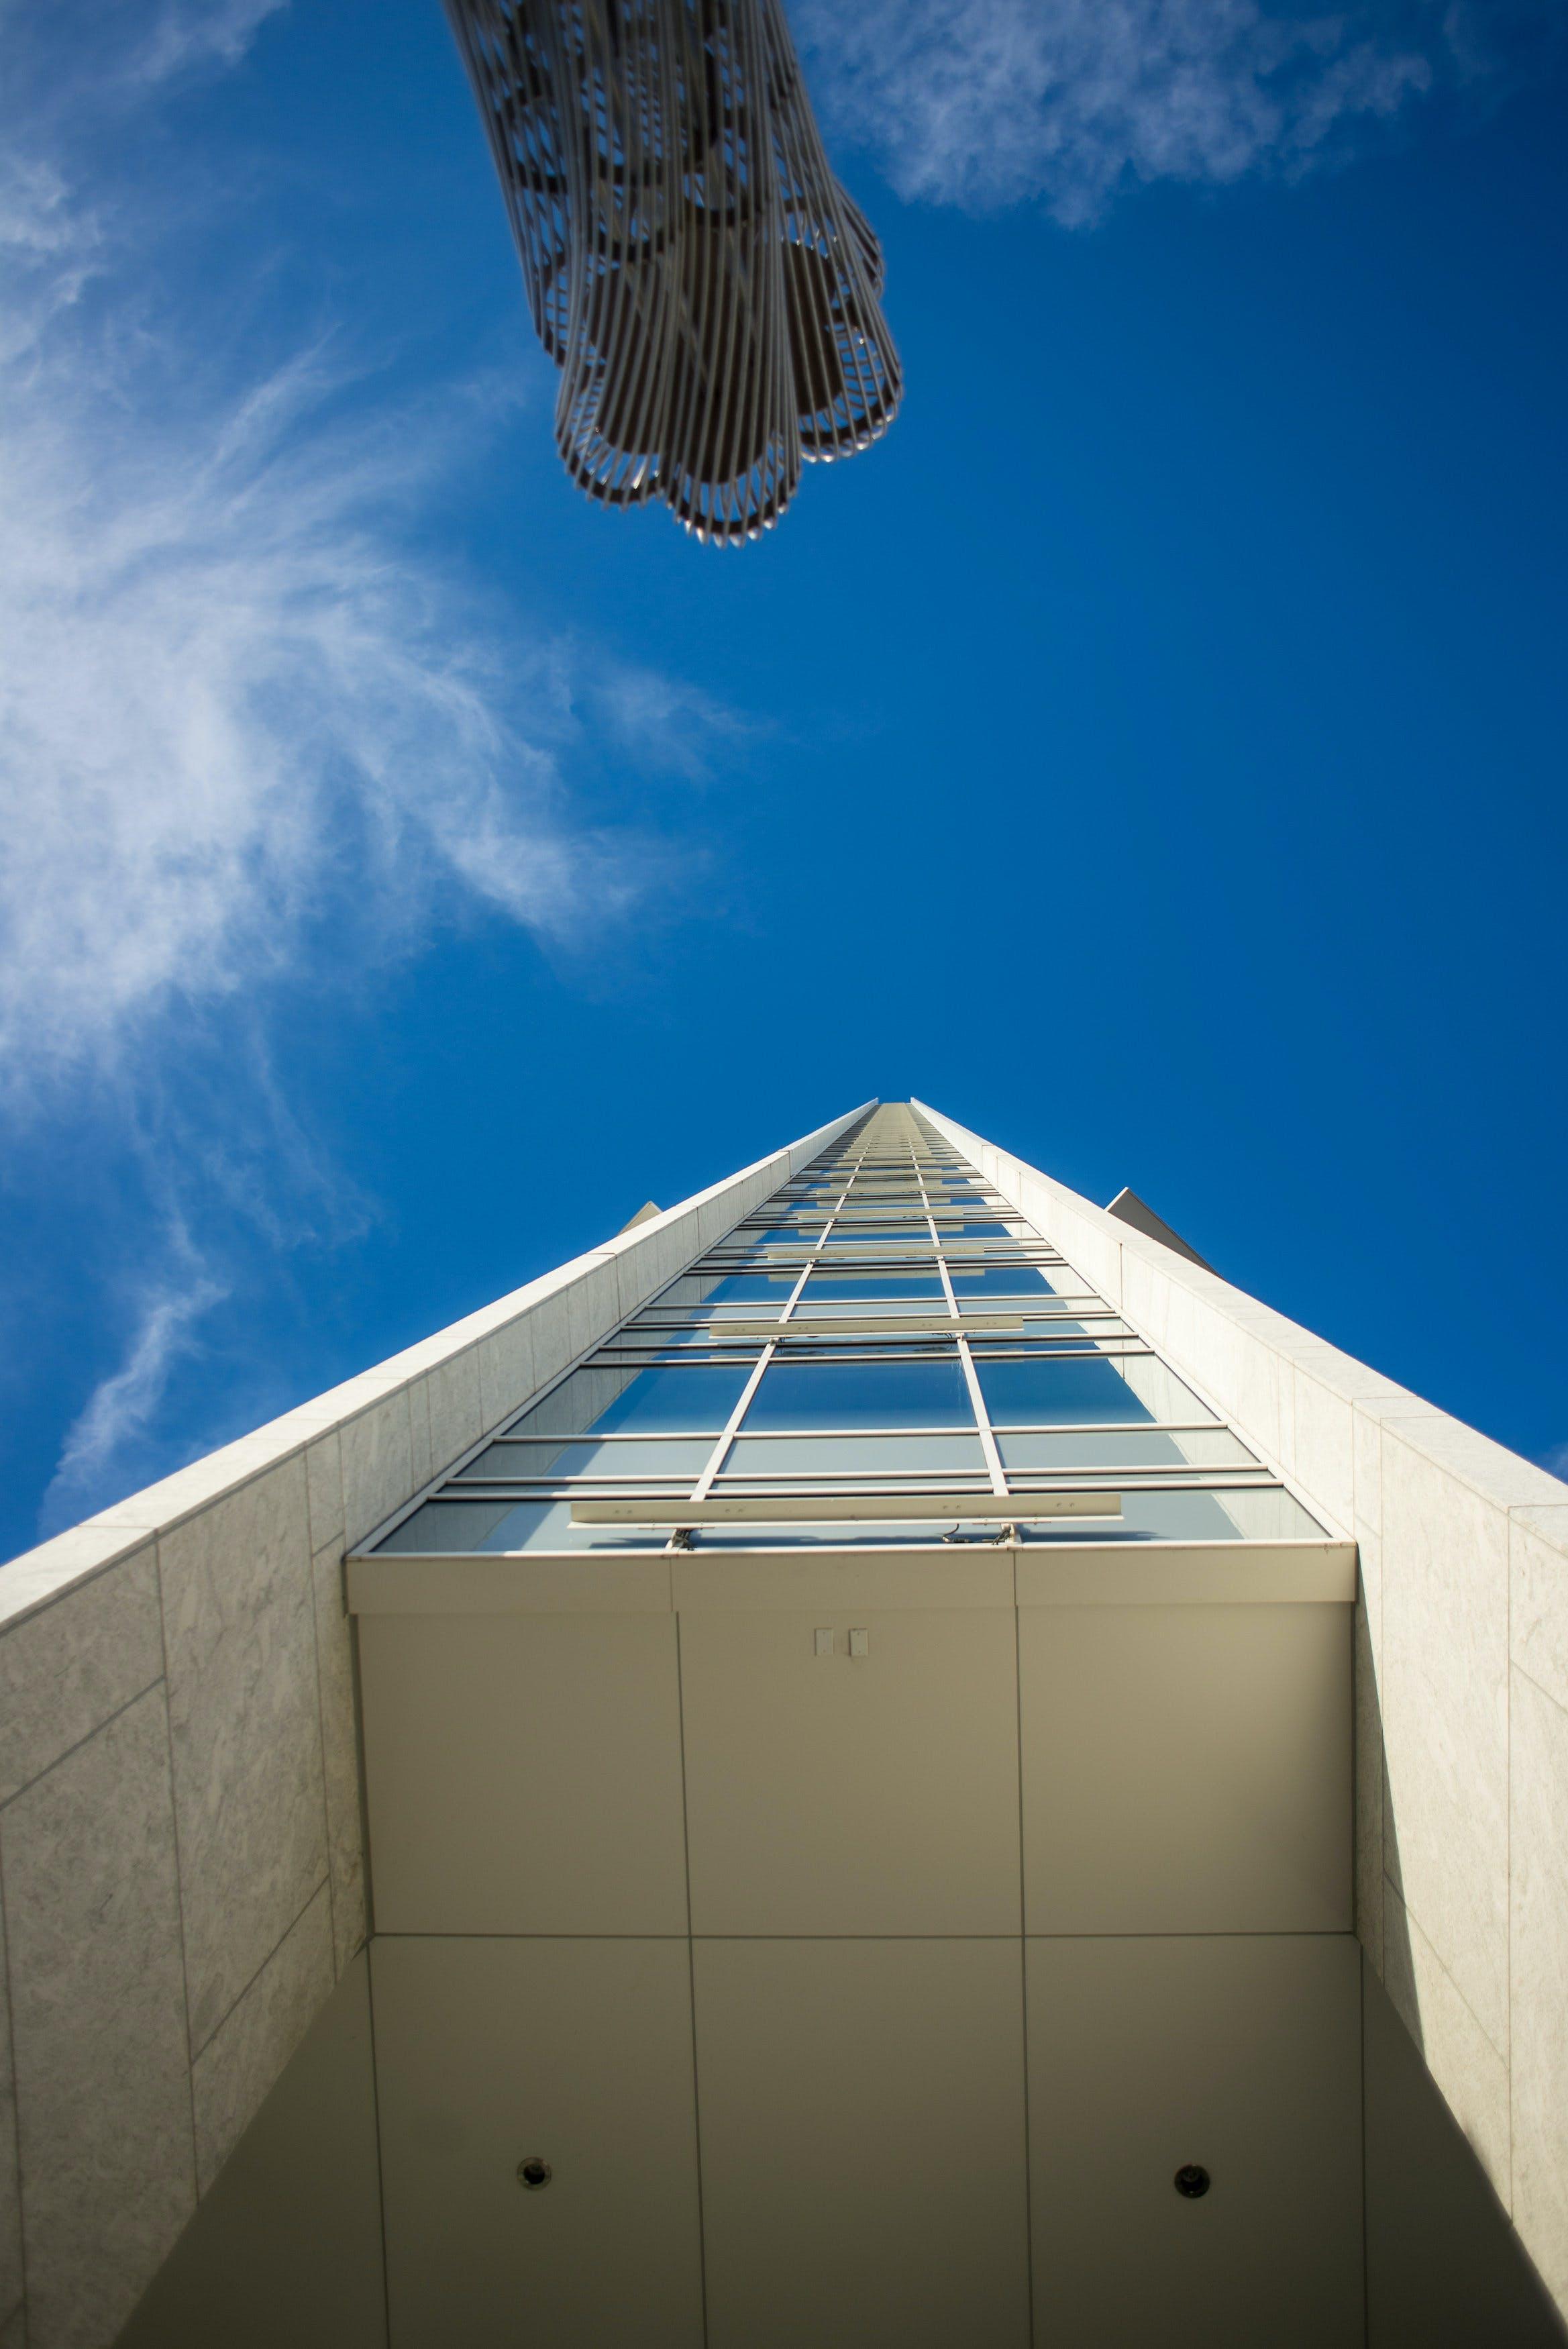 arkitektur, byggnad, dagsljus